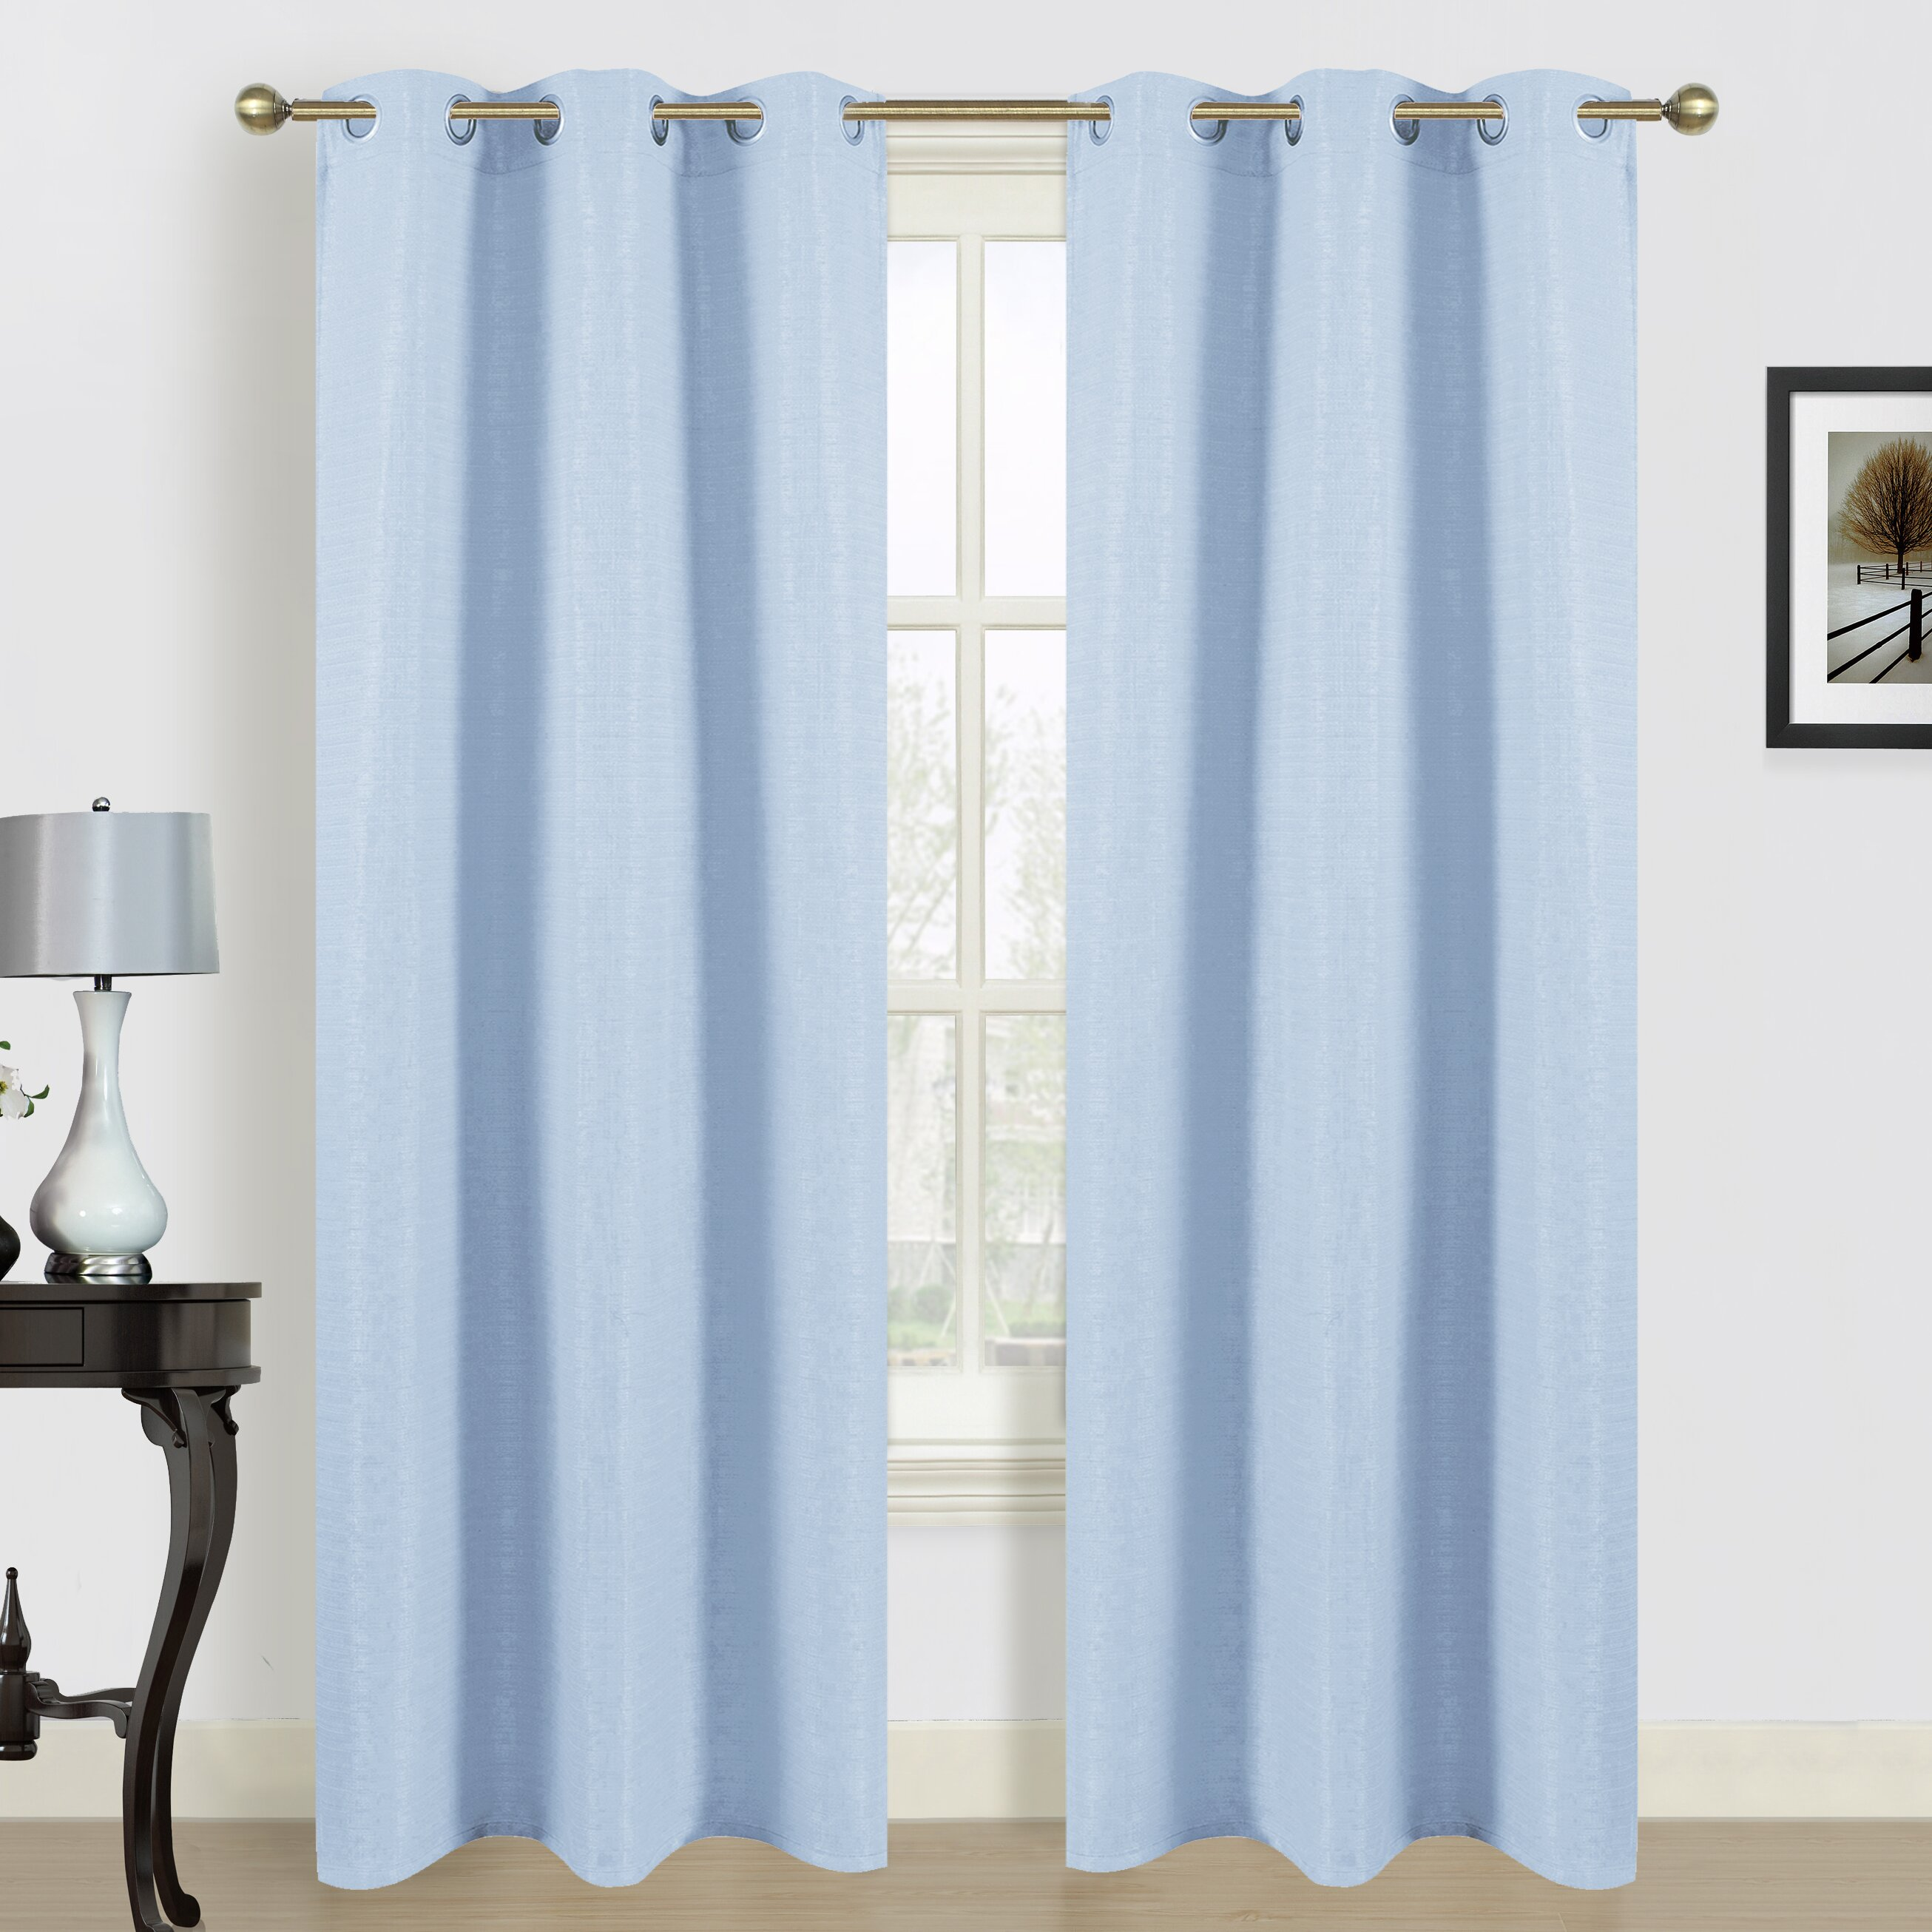 Dainty Home Blended Curtain Panel Reviews Wayfair